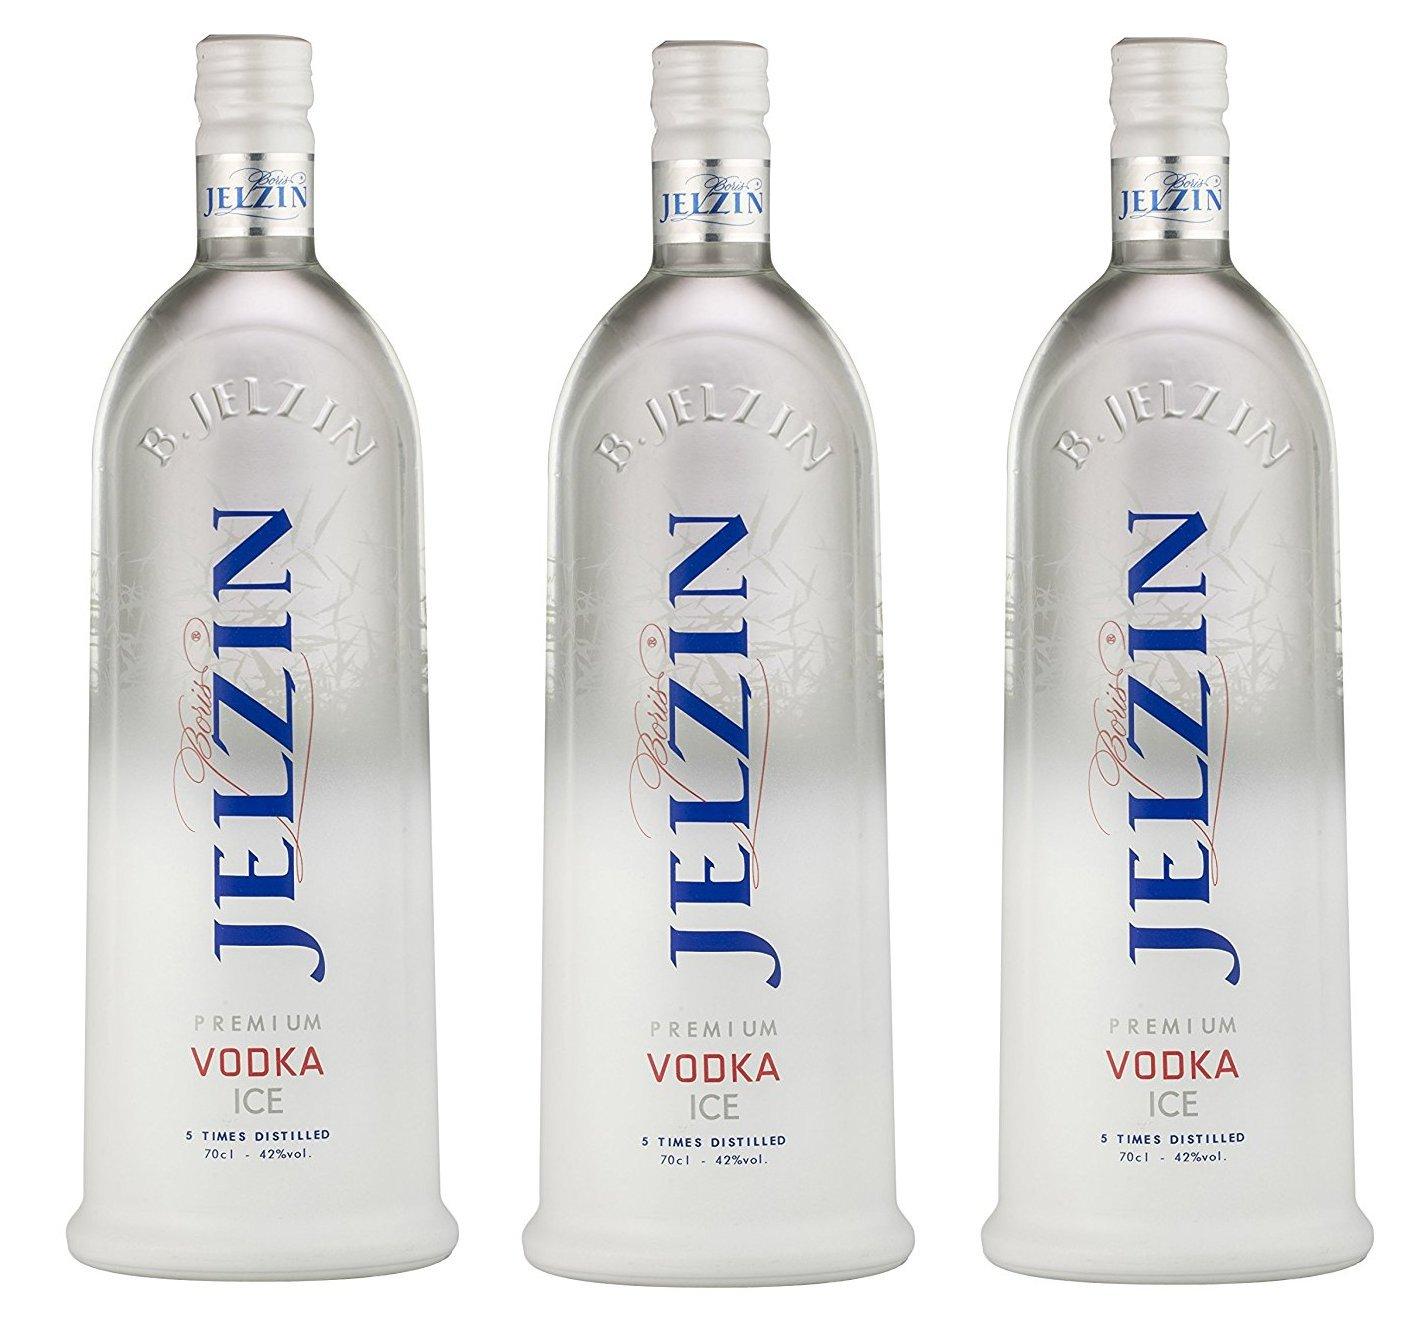 Jelzin Vodka Ice Premium (3 x 0.7 l): Amazon.de: Bier, Wein ...